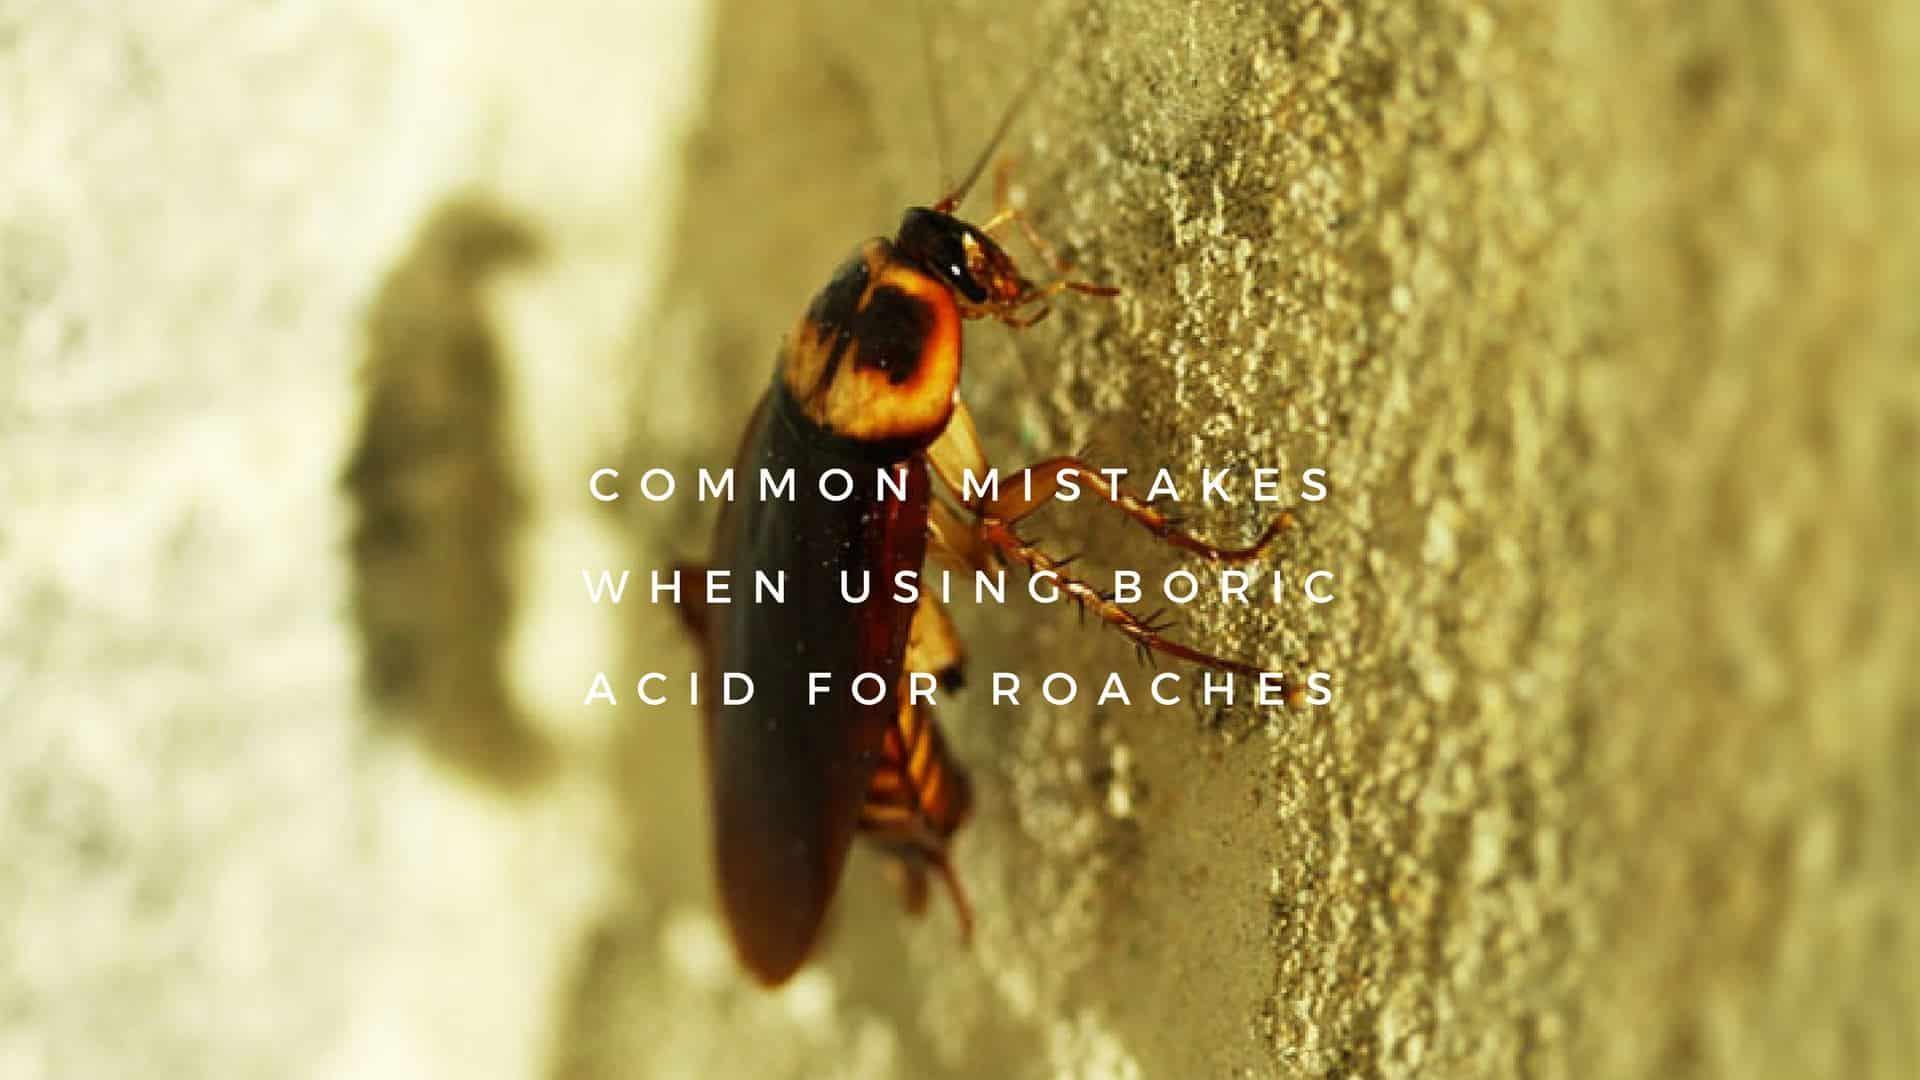 Using Boric Acid for Roaches